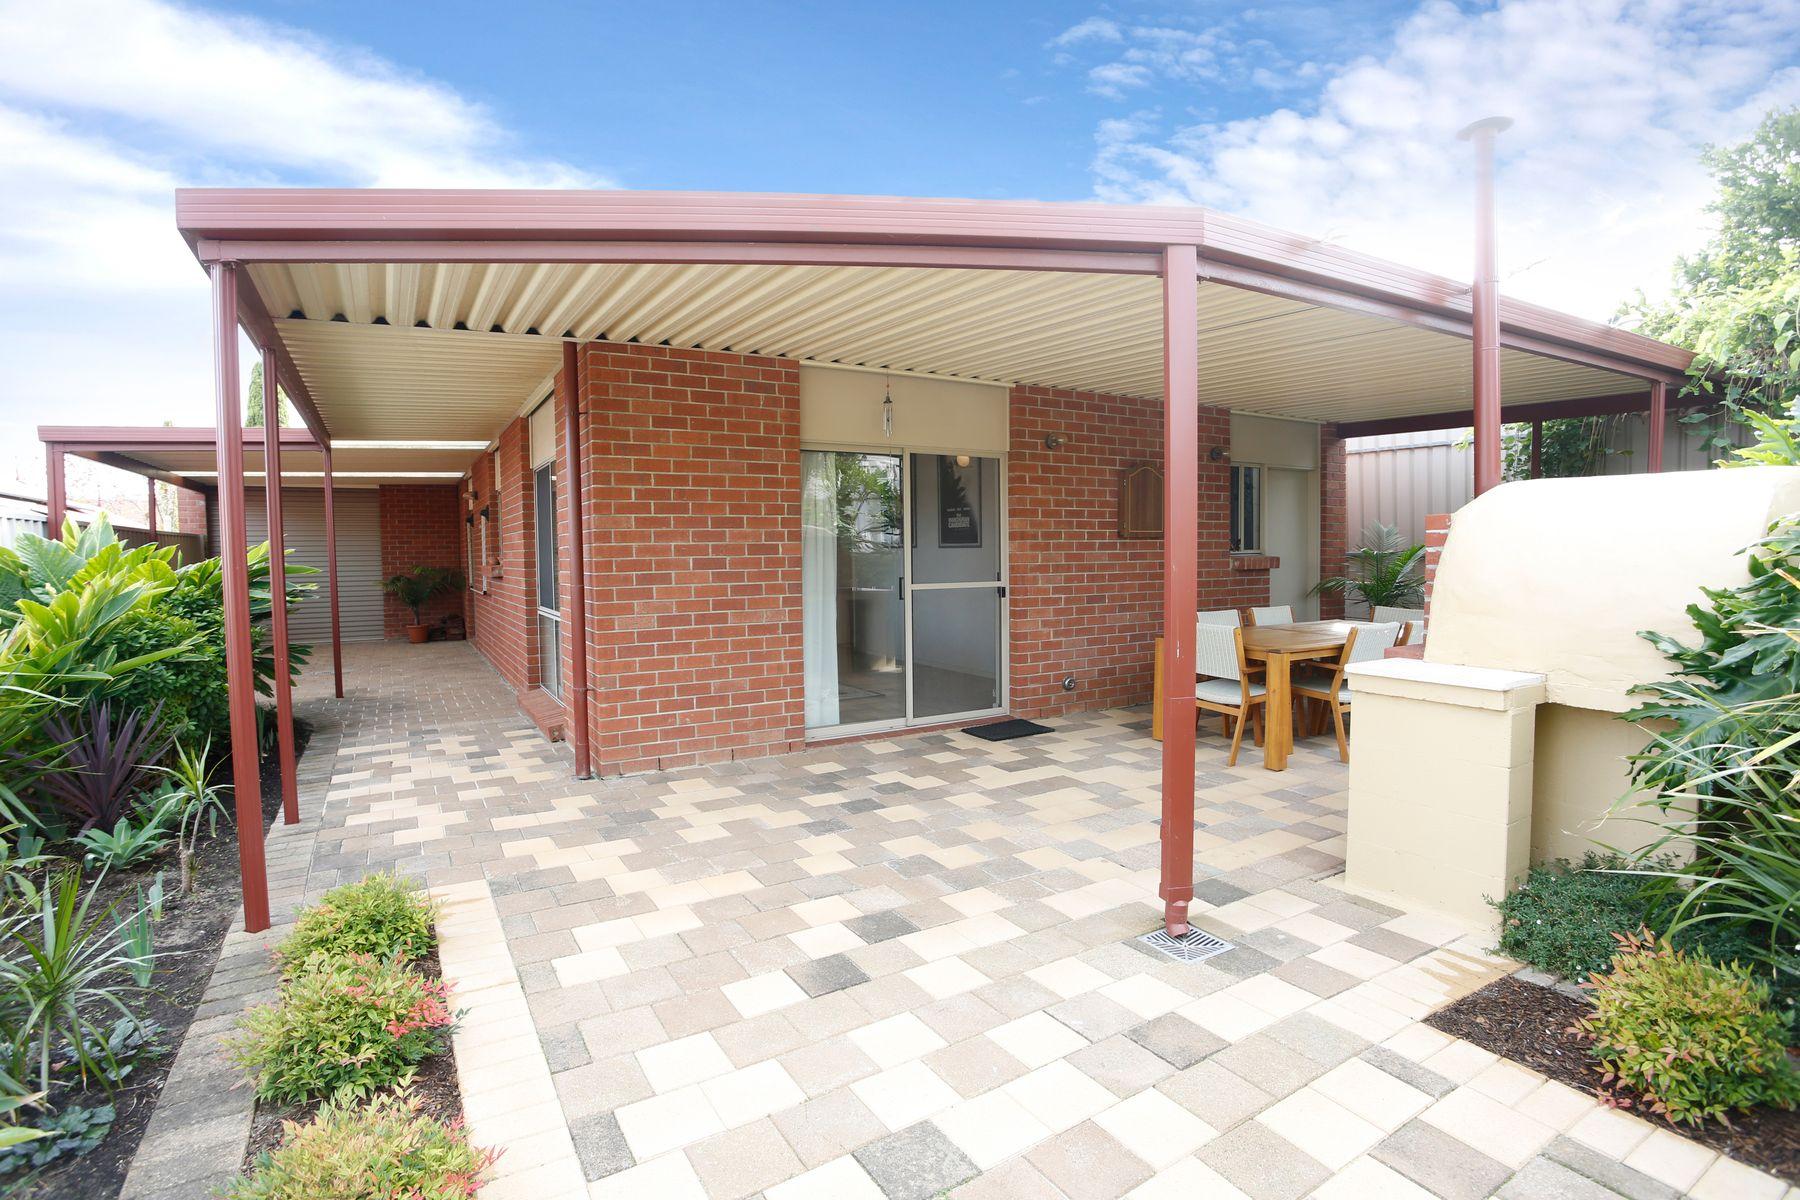 5 Pinewood Court, Golden Grove, SA 5125